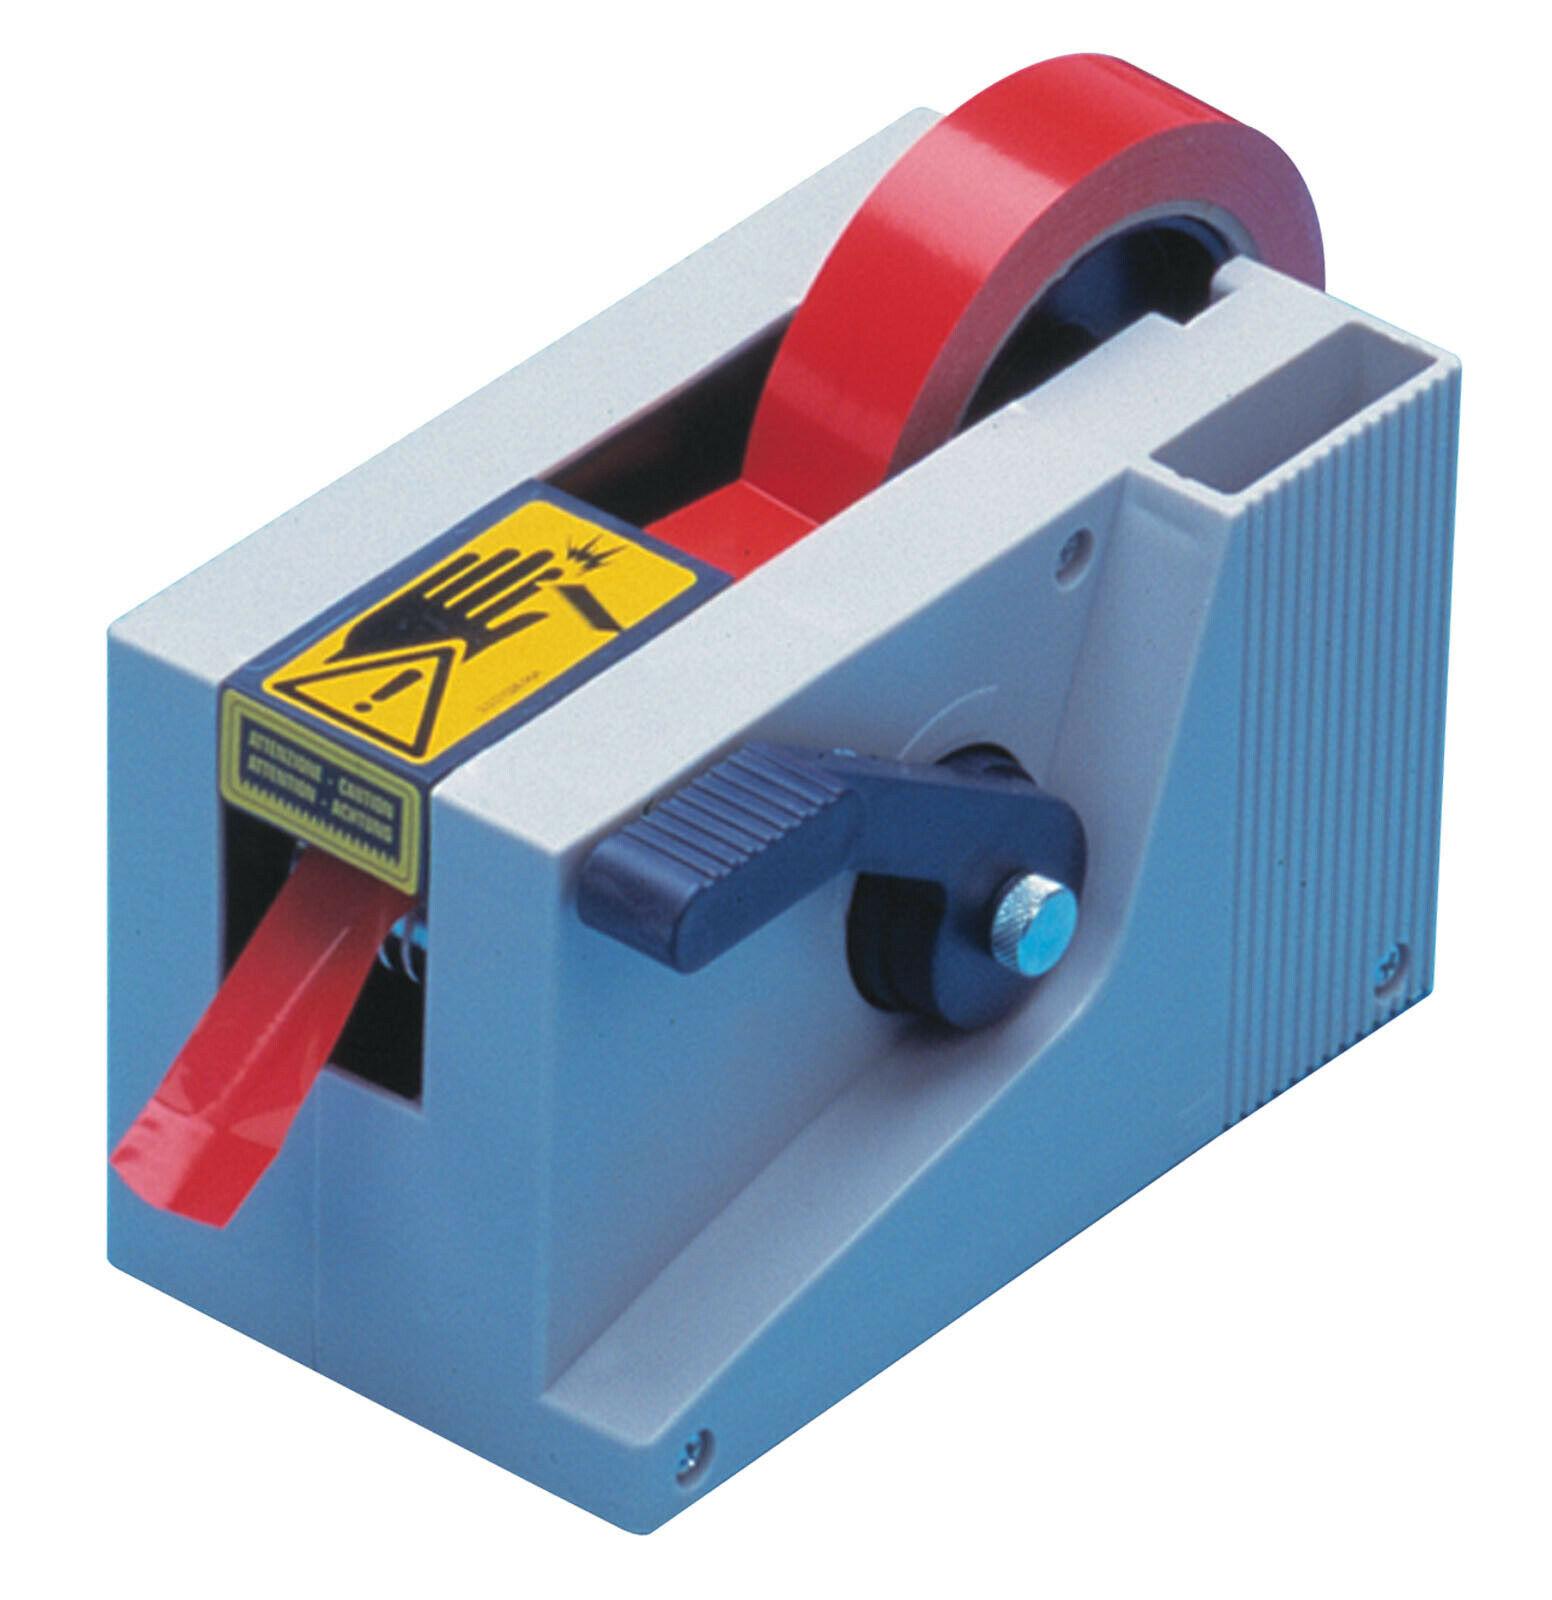 PD380 Manual Pre Length Bench Worktop Tape Dispenser 25mm Wide Tape 75mm Cores 133073792285 - PD380 Manual Pre Length Bench Worktop Tape Dispenser 25mm Wide Tape 75mm Cores